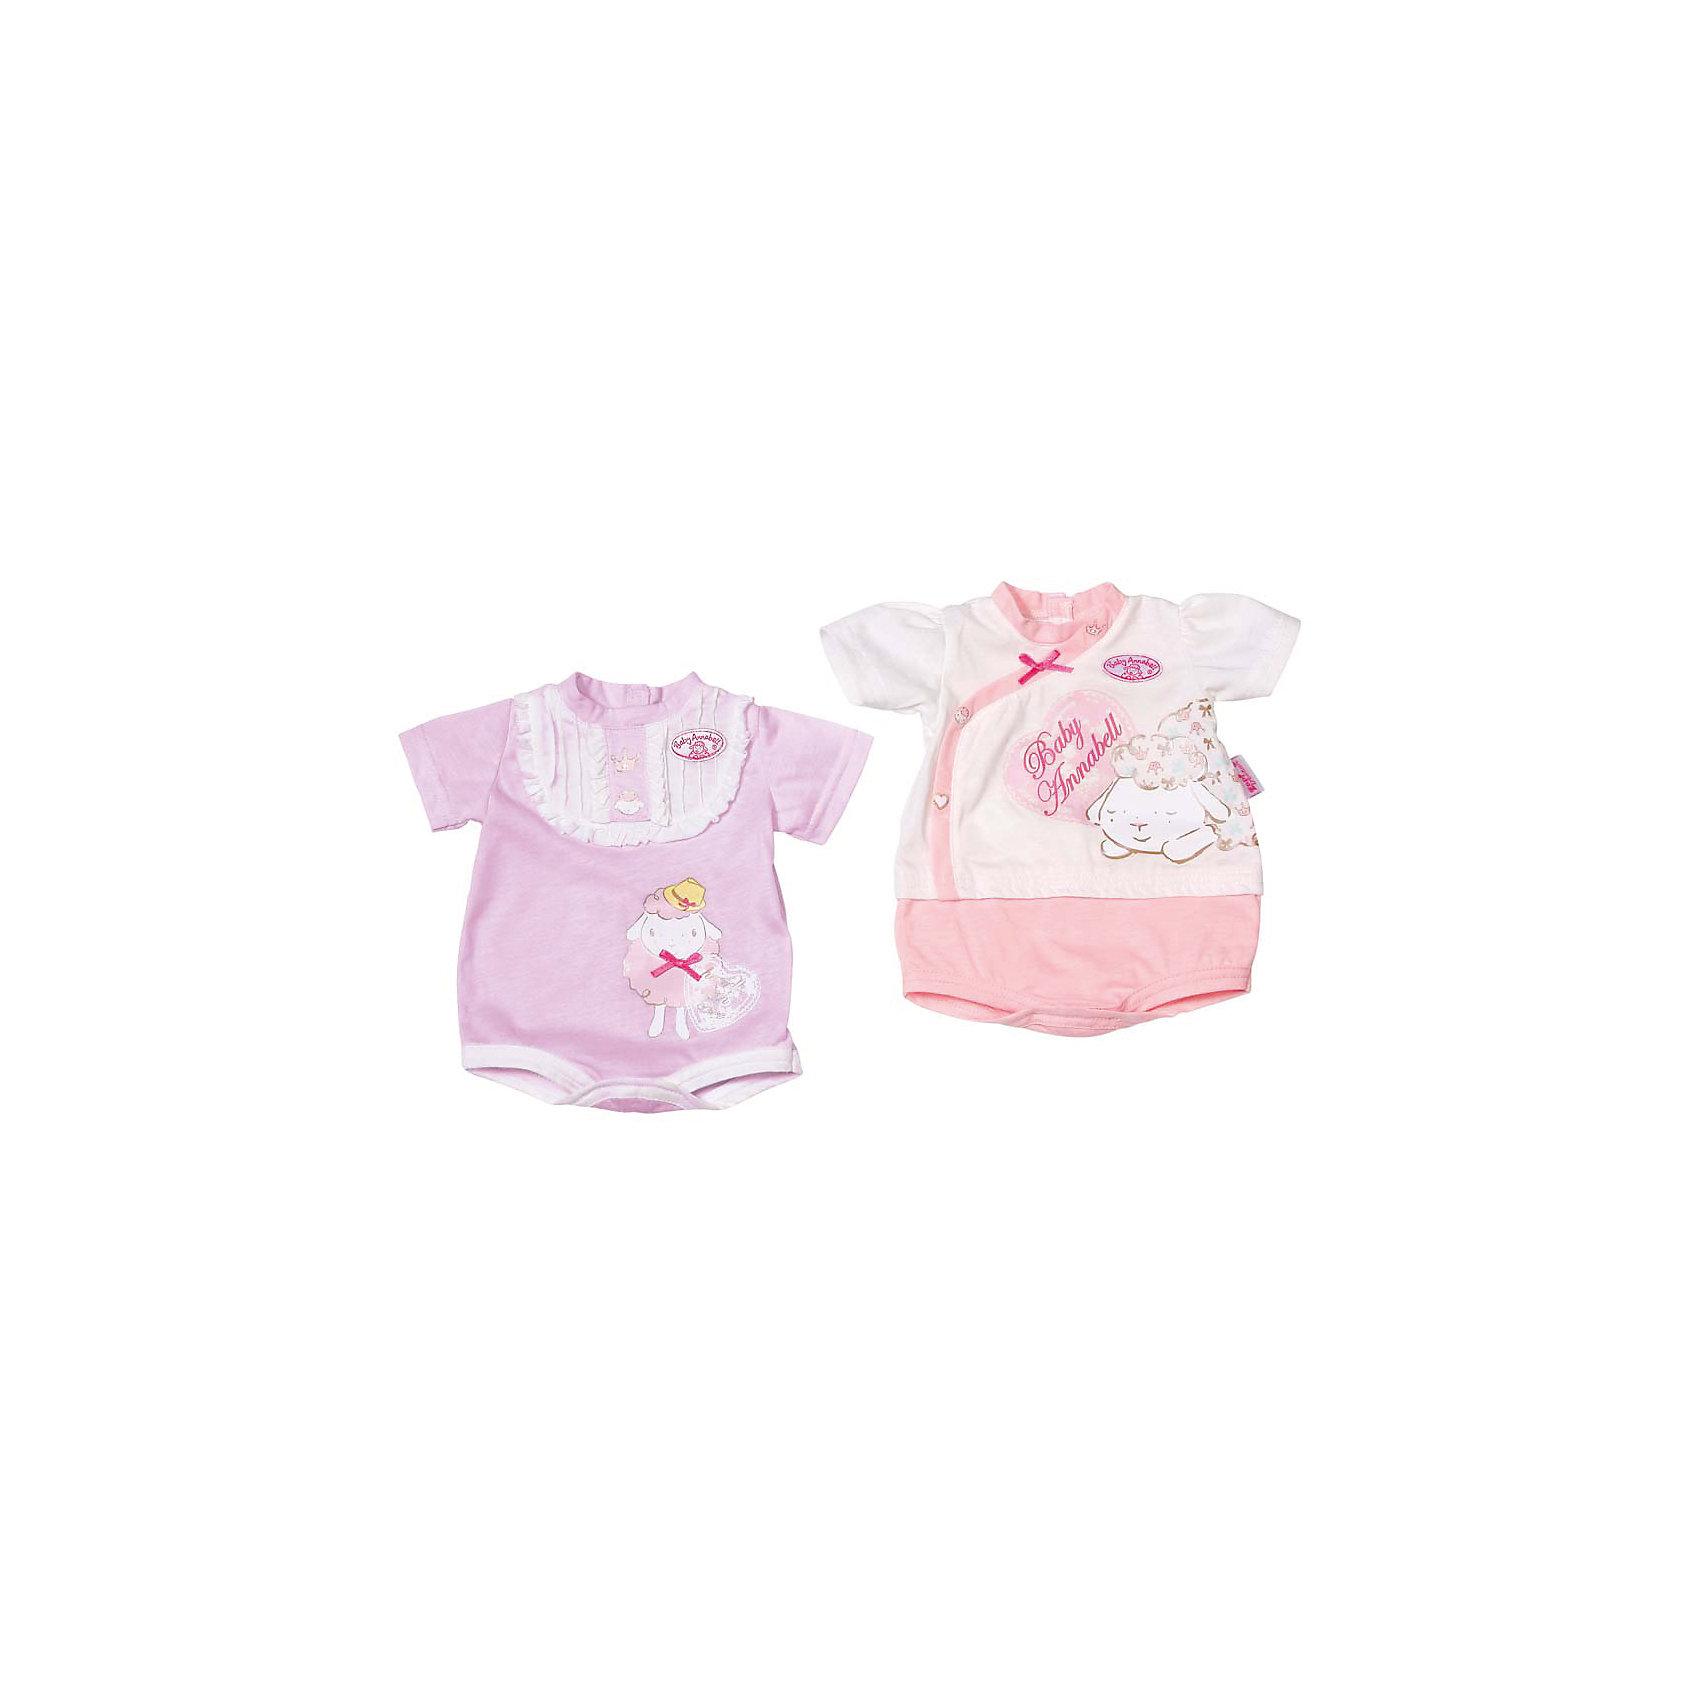 Zapf Creation Нижнее белье, белый, Baby Annabell zapf creation горшок для кукол baby annabell с аксессуарами